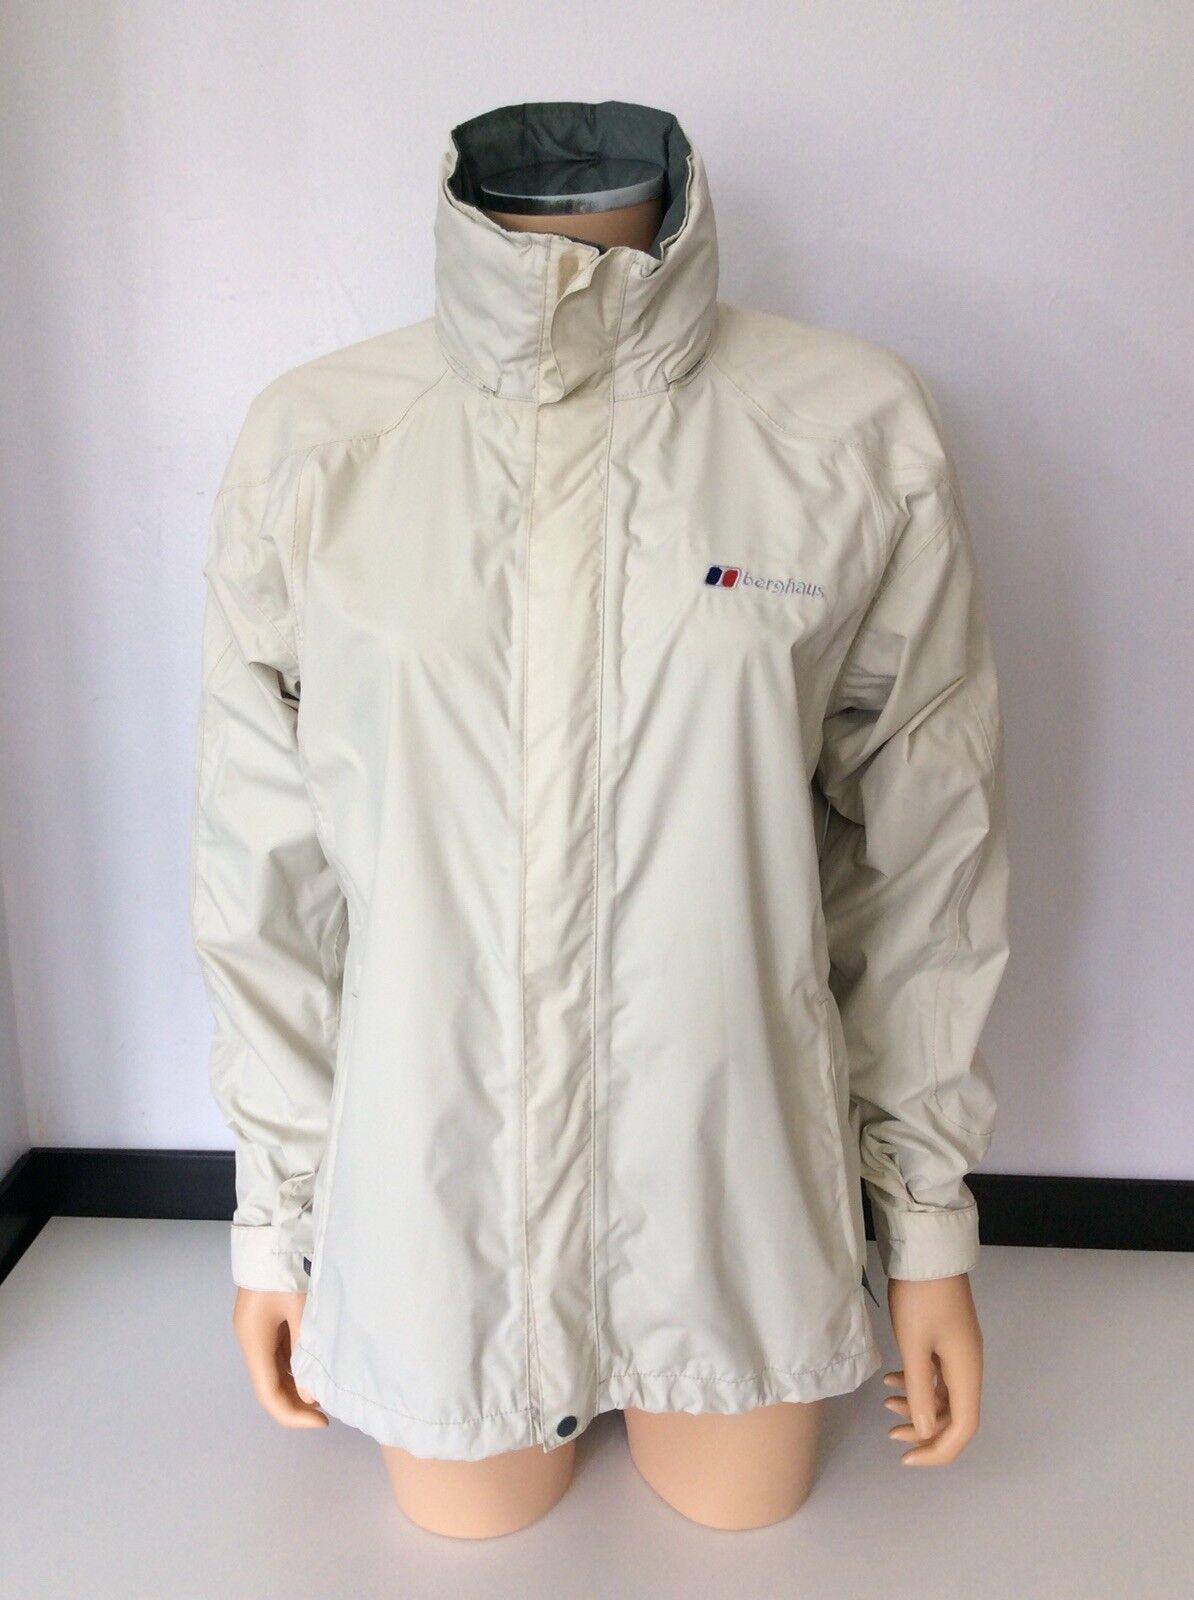 Berghaus Beige Waterproof Rain jacke Coat Größe 38 Uk 10 Immaculate  AQ2